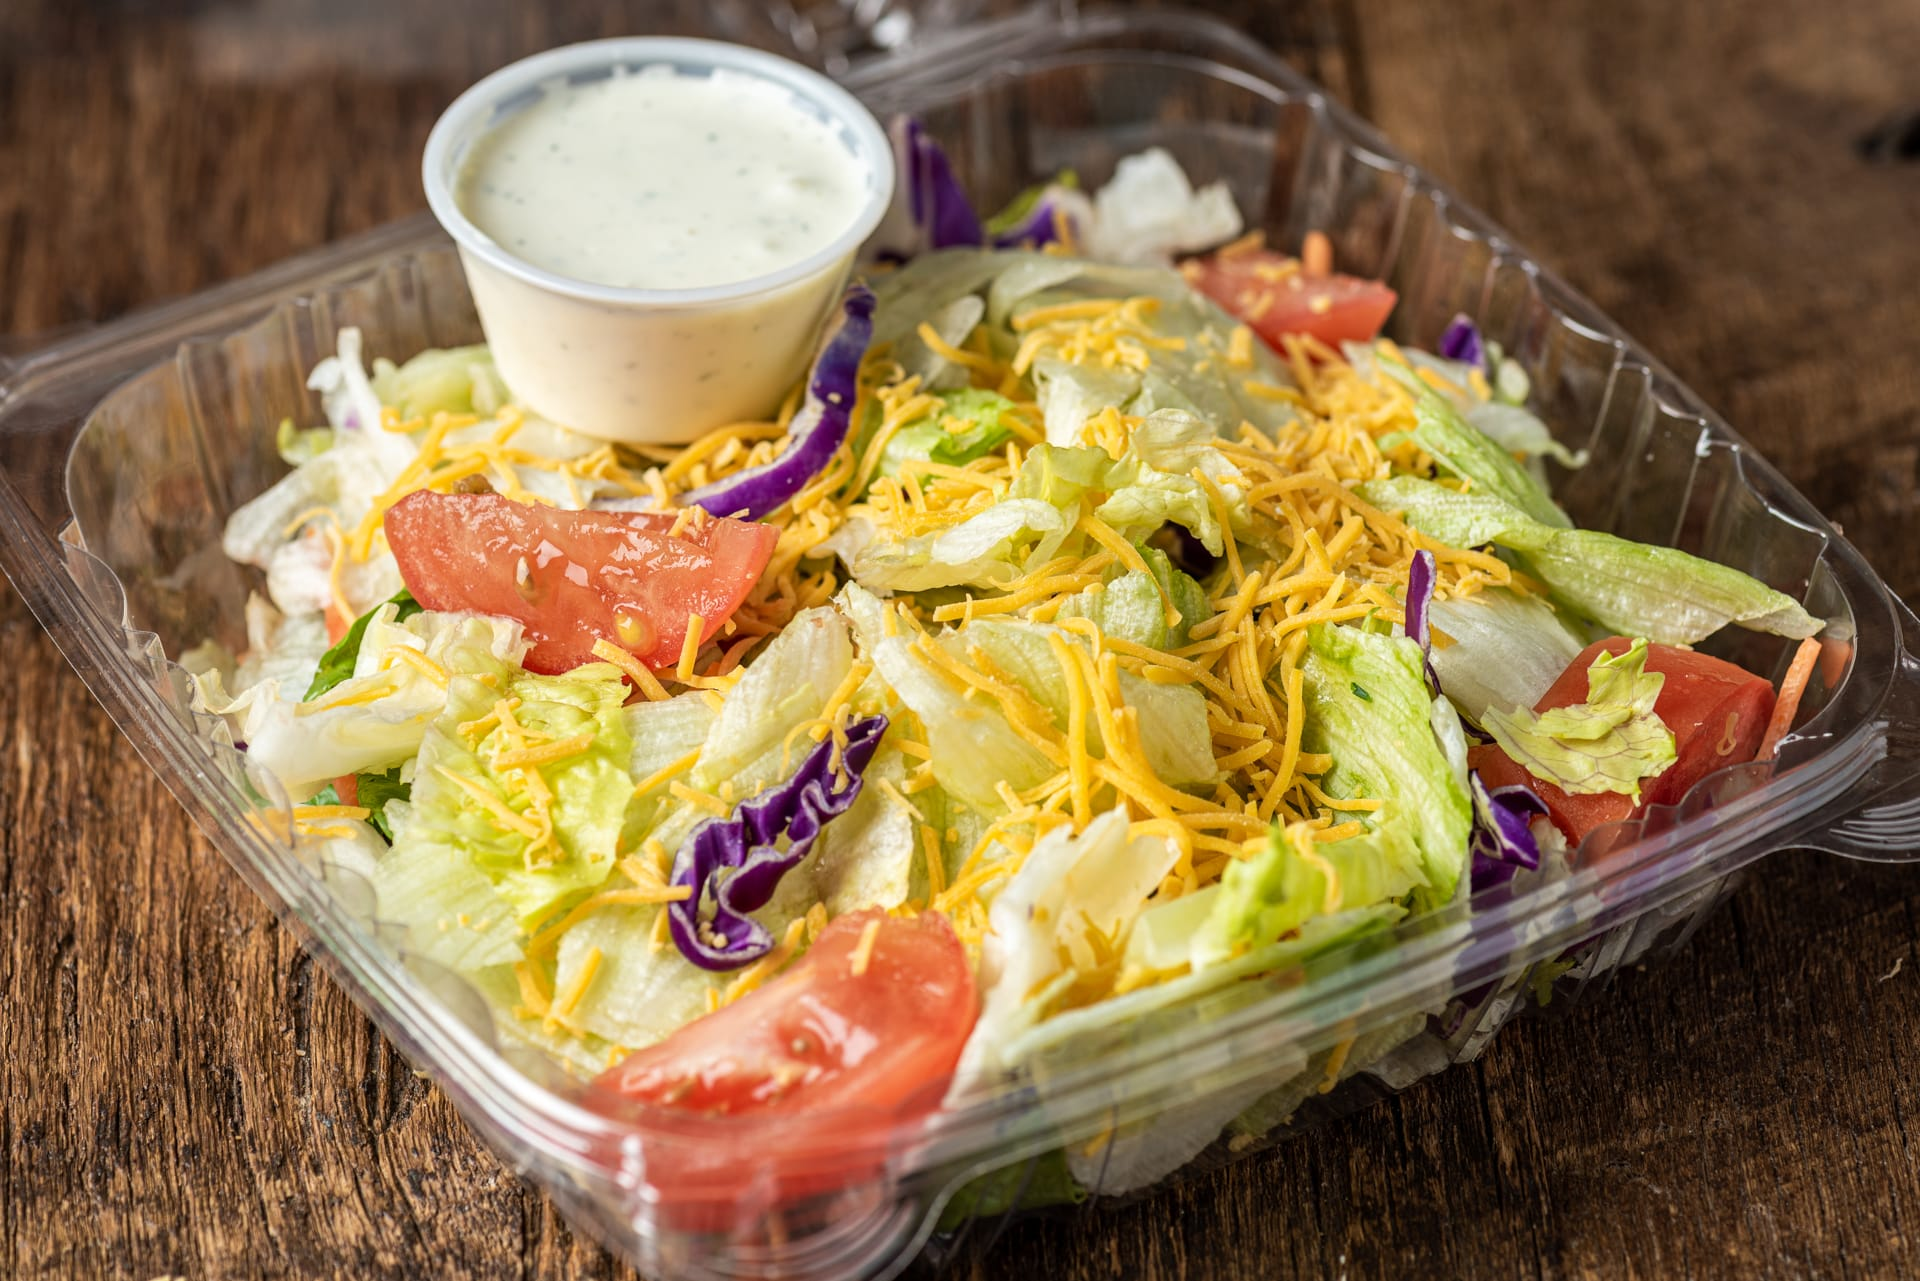 Mo's Salad